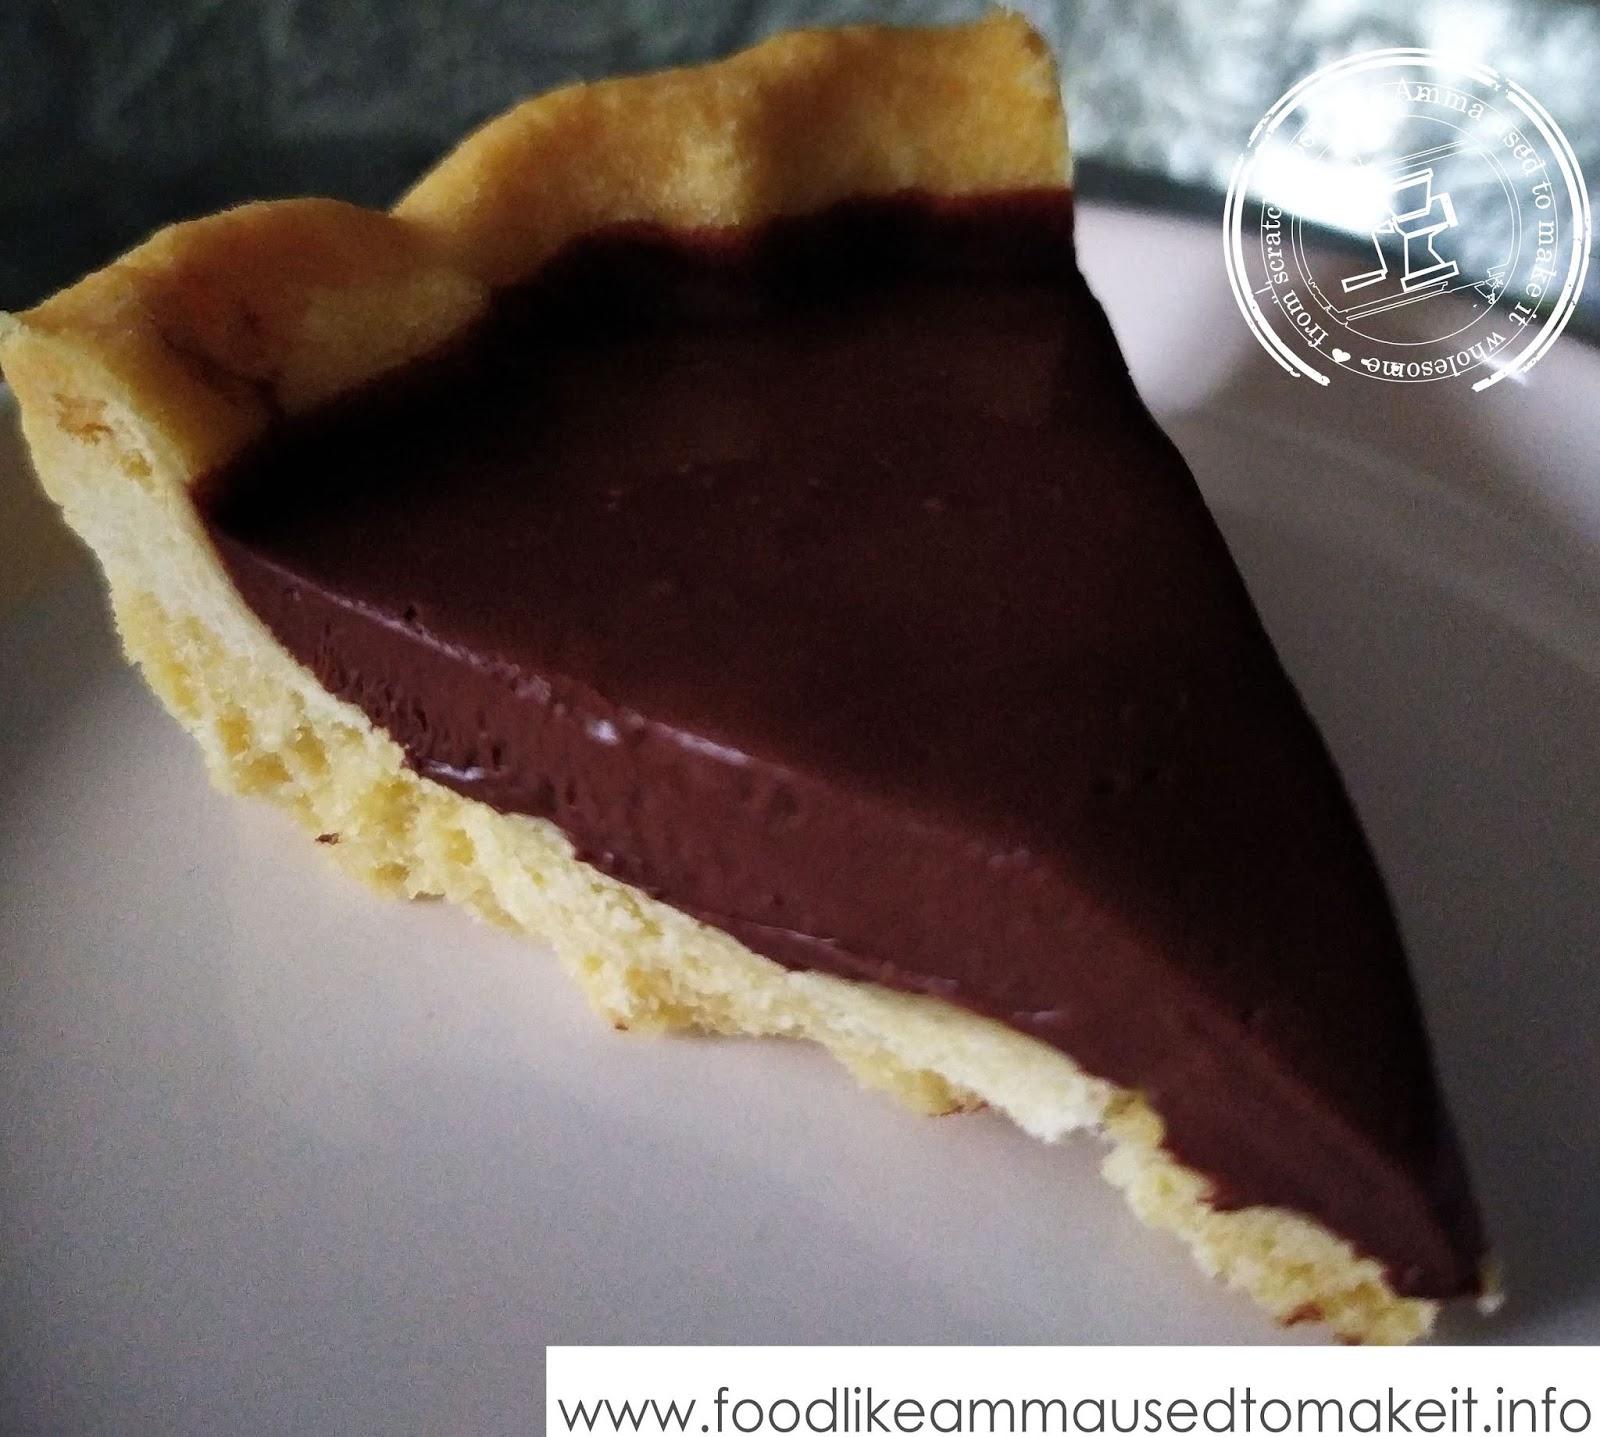 Chocolate Ganache Tart with Shortbread Crust